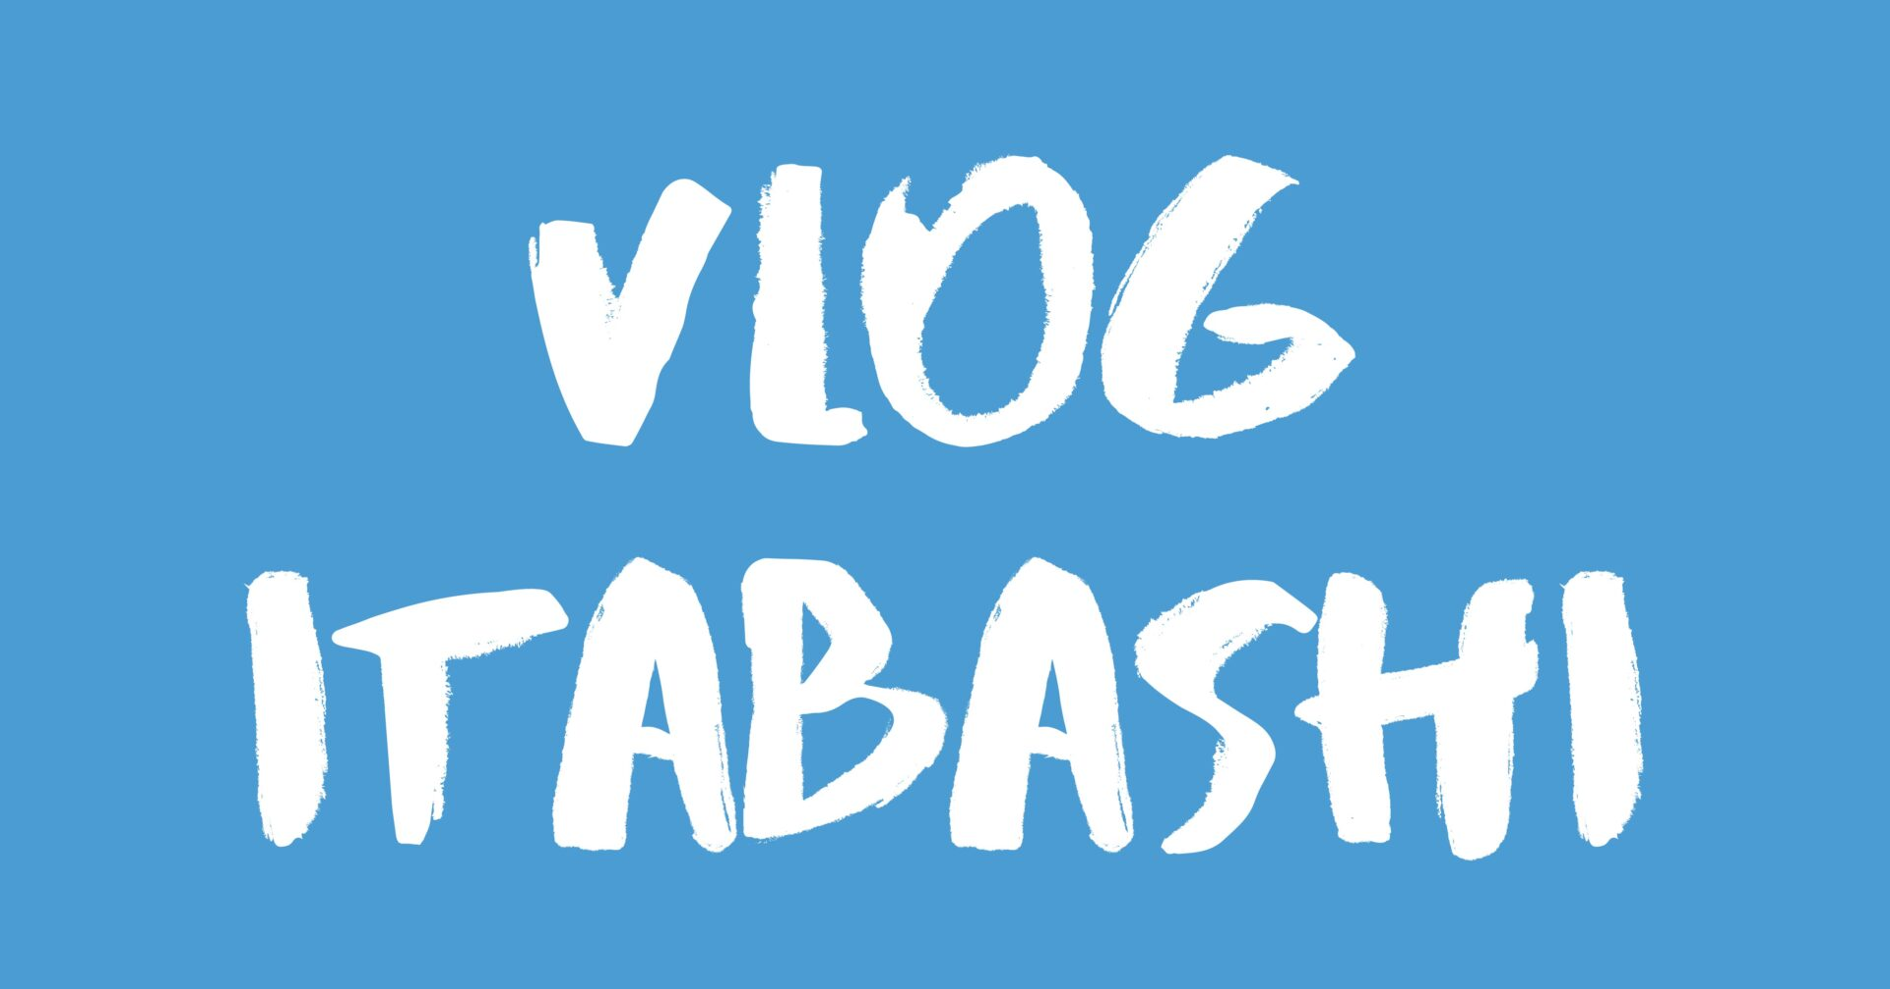 [Vlog] 板橋 / Itabashi